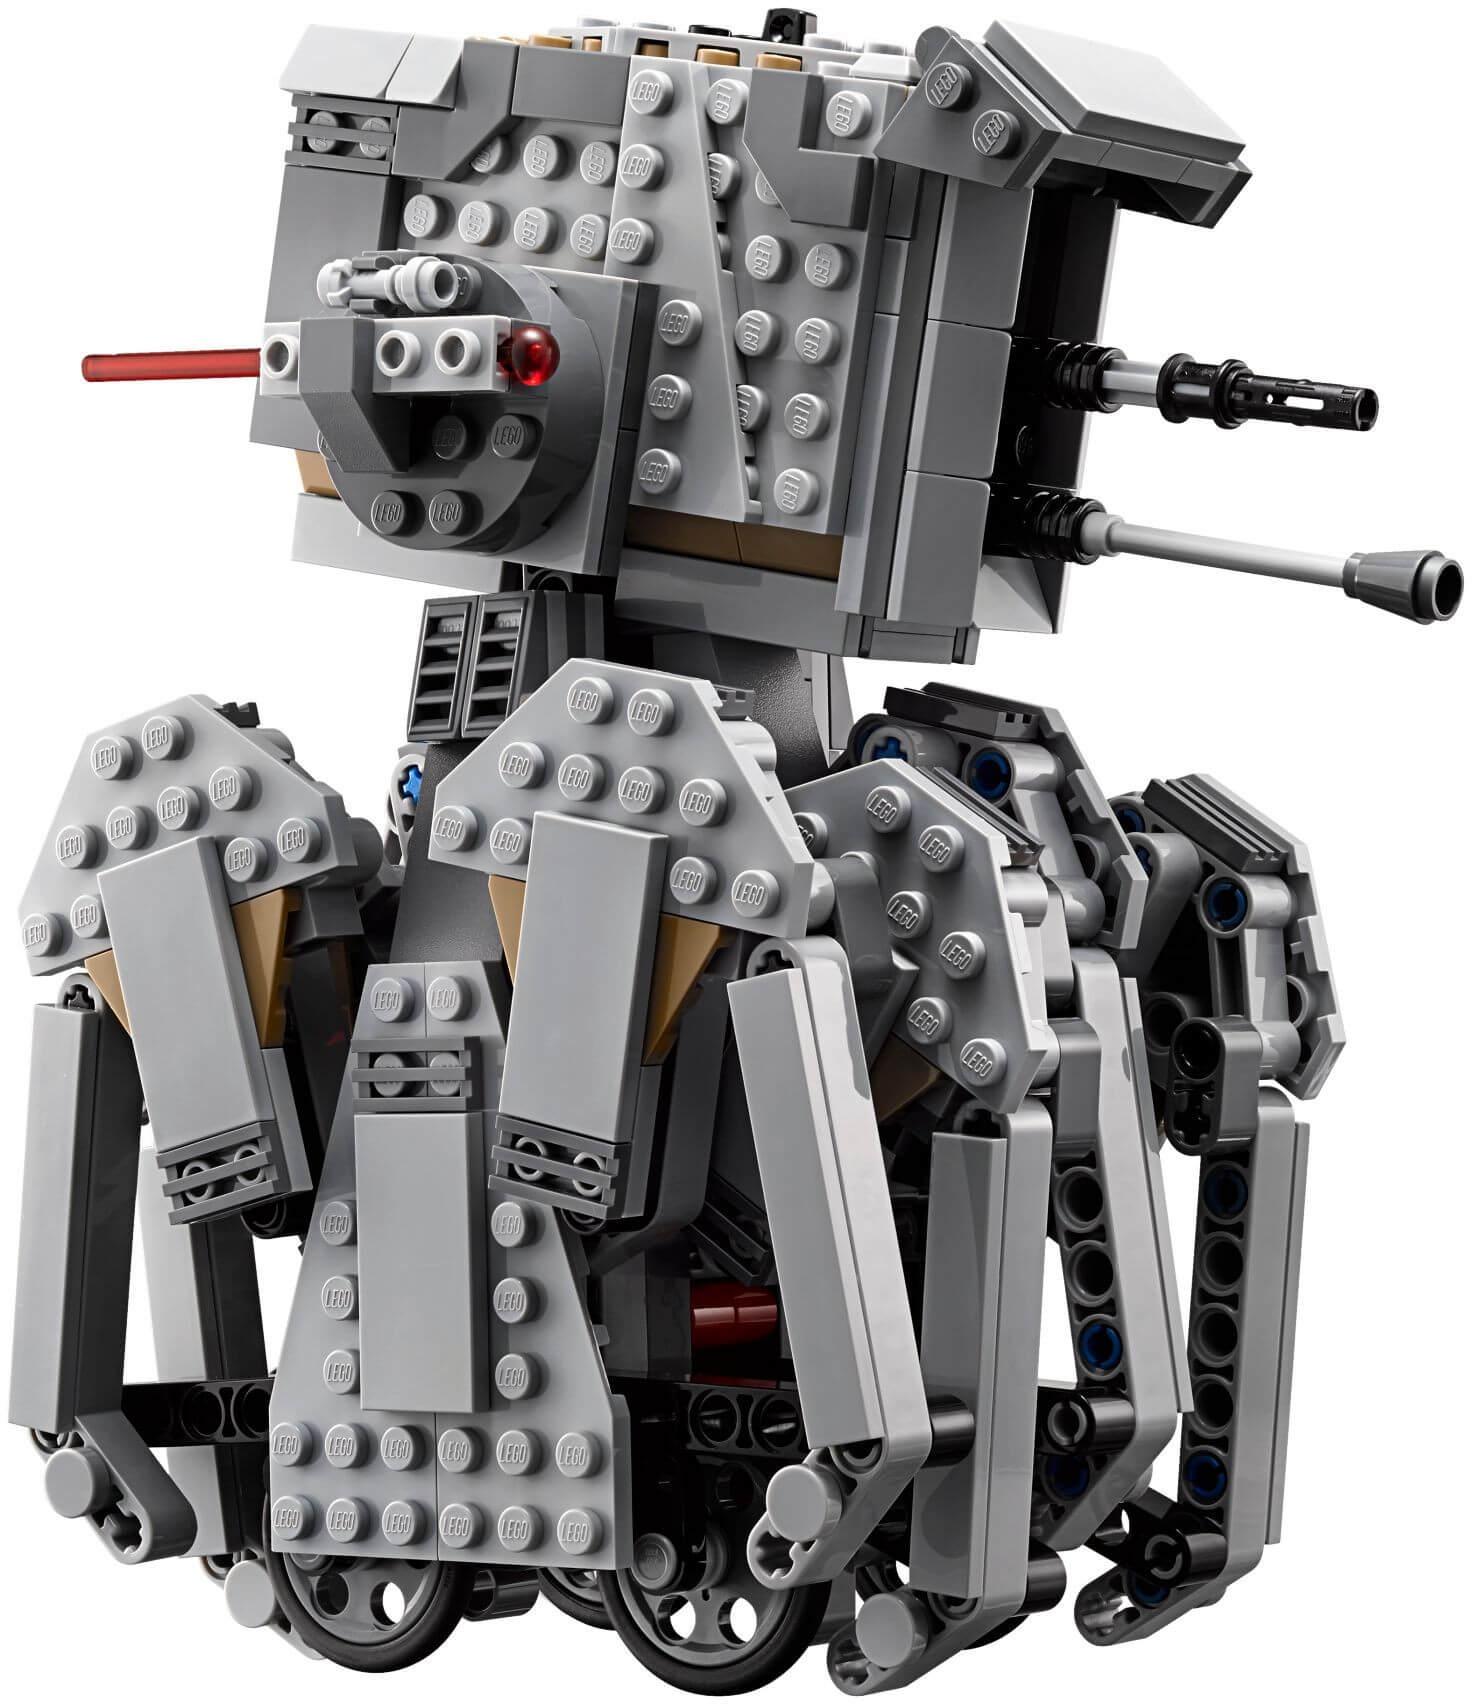 Mua đồ chơi LEGO 75177 - LEGO Star Wars 75177 - Nhện Máy Hạng Nặng First Order - First Order Heavy Scout Walker